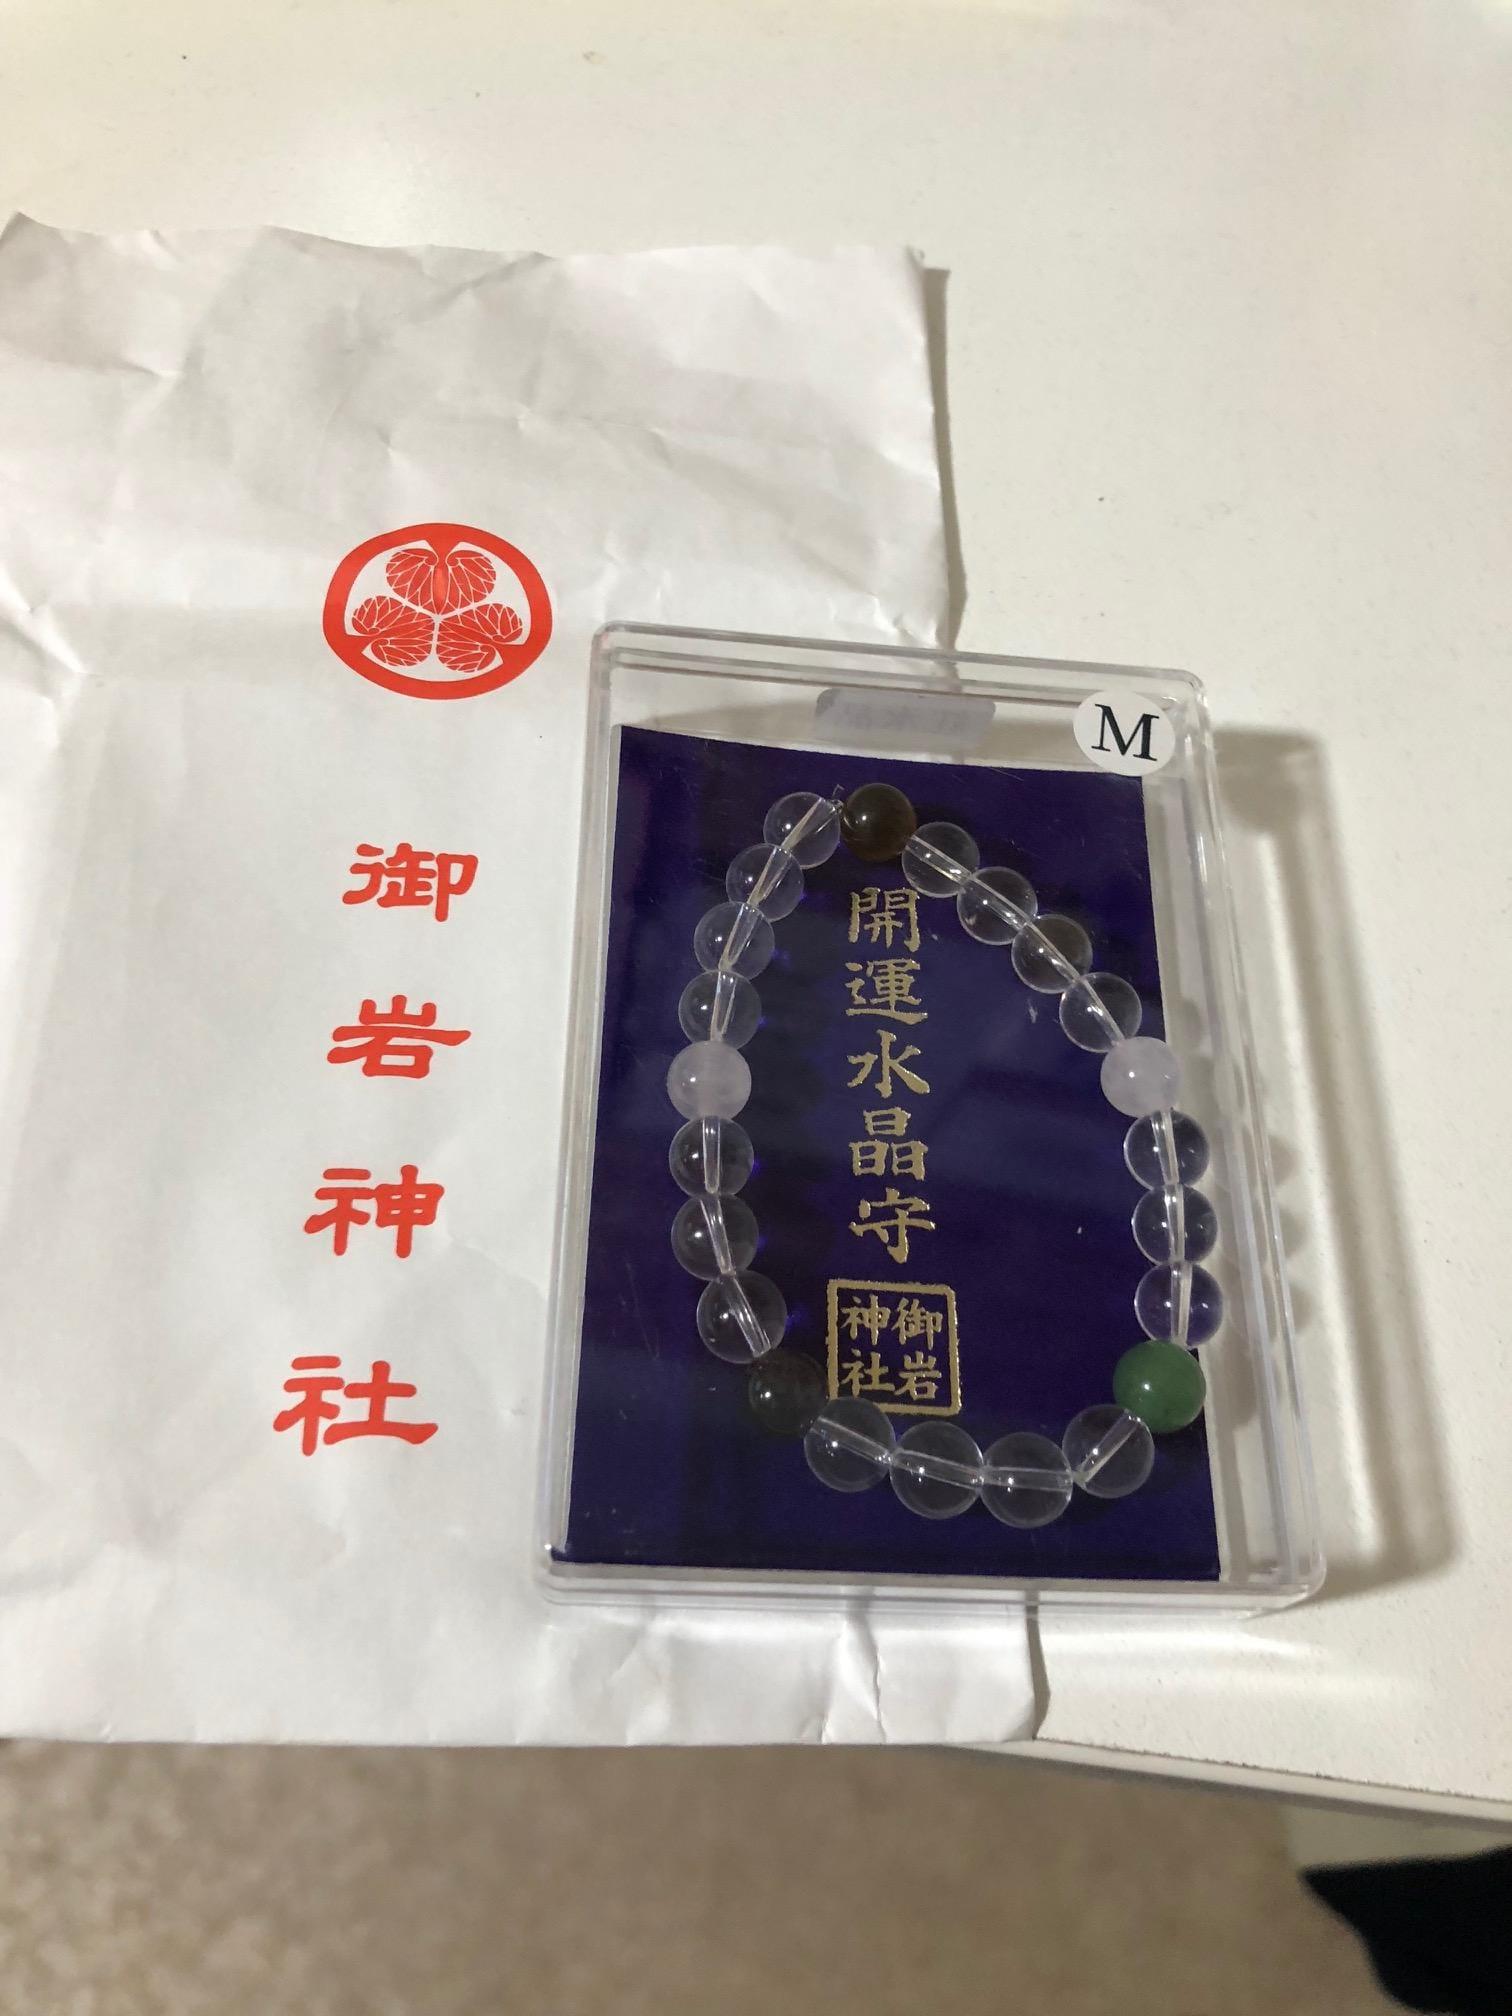 https://s3-ap-northeast-1.amazonaws.com/files.deli-fuzoku.jp/img/shop/hkadankamisu/diary/26032462/d_0_20180706092844116.jpeg